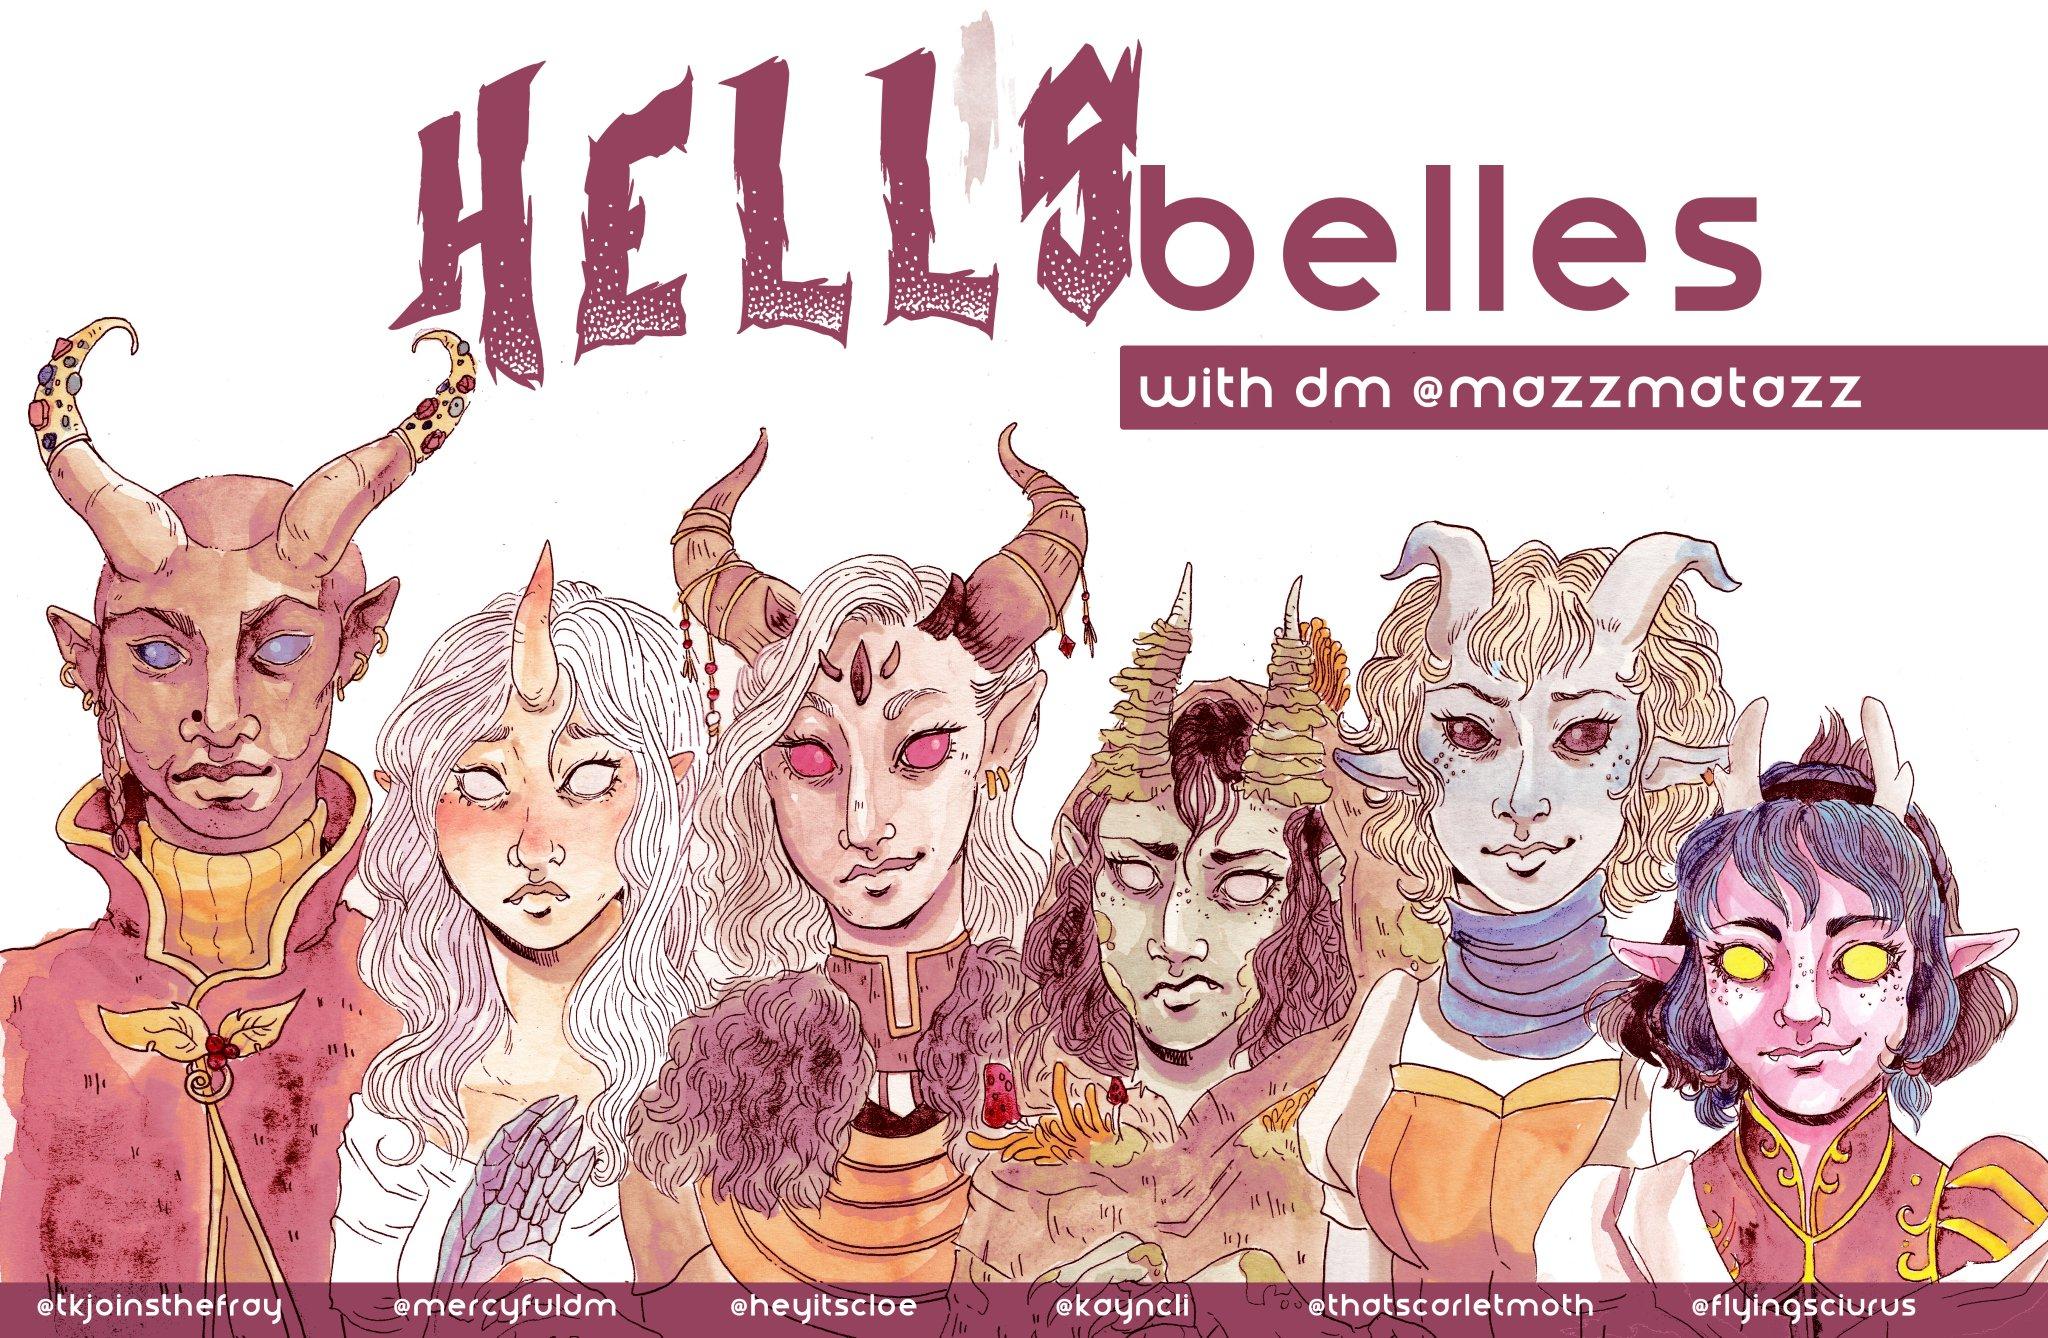 kayla-cline Hell's Belles, un party di soli tiefling - by Kayla Cline www.kaylacline.com (2018-01) © dell'autore, tutti i diritti riservati